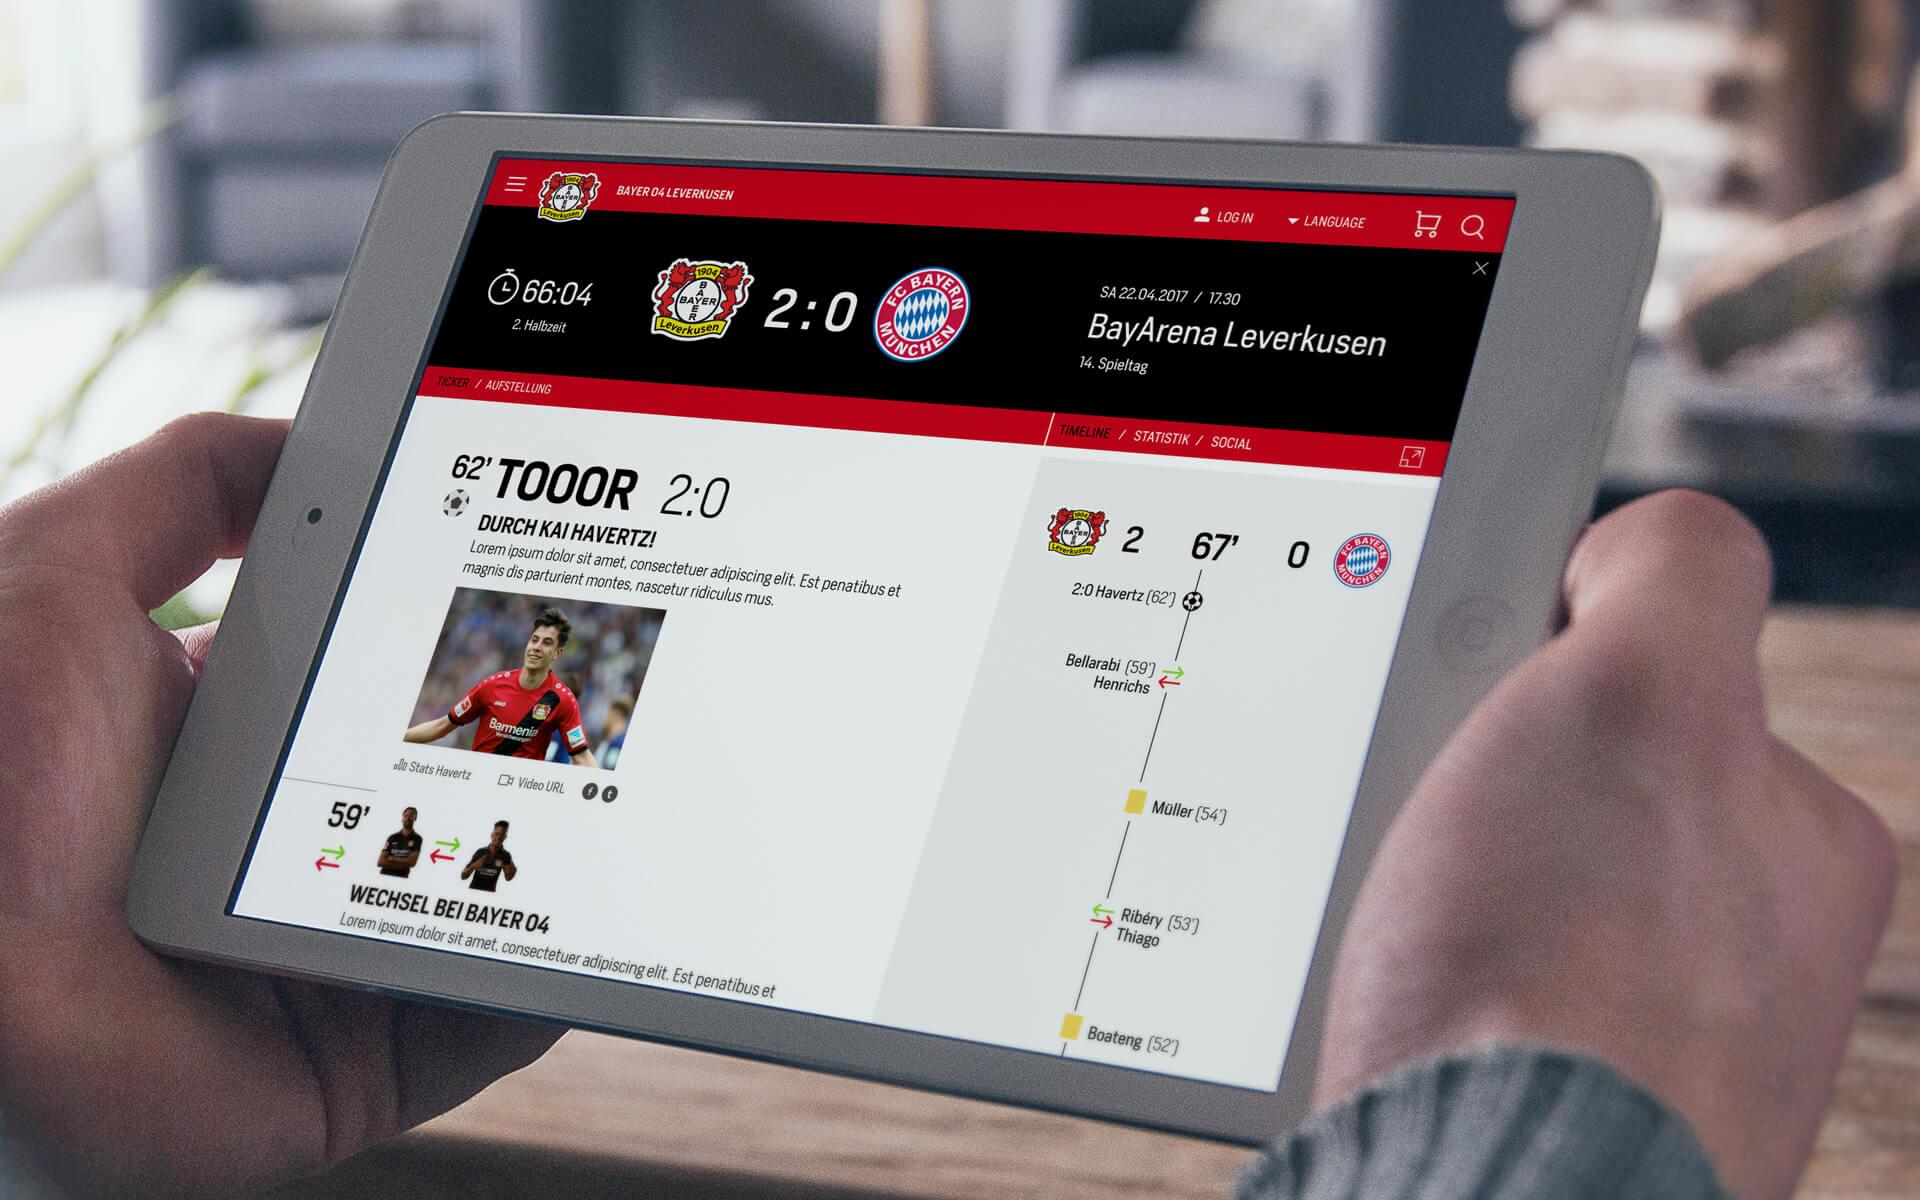 Bayer 04 Website Relaunch, responsives Redesign, Liveticker, Webdesign, UX, UI, Tablet View